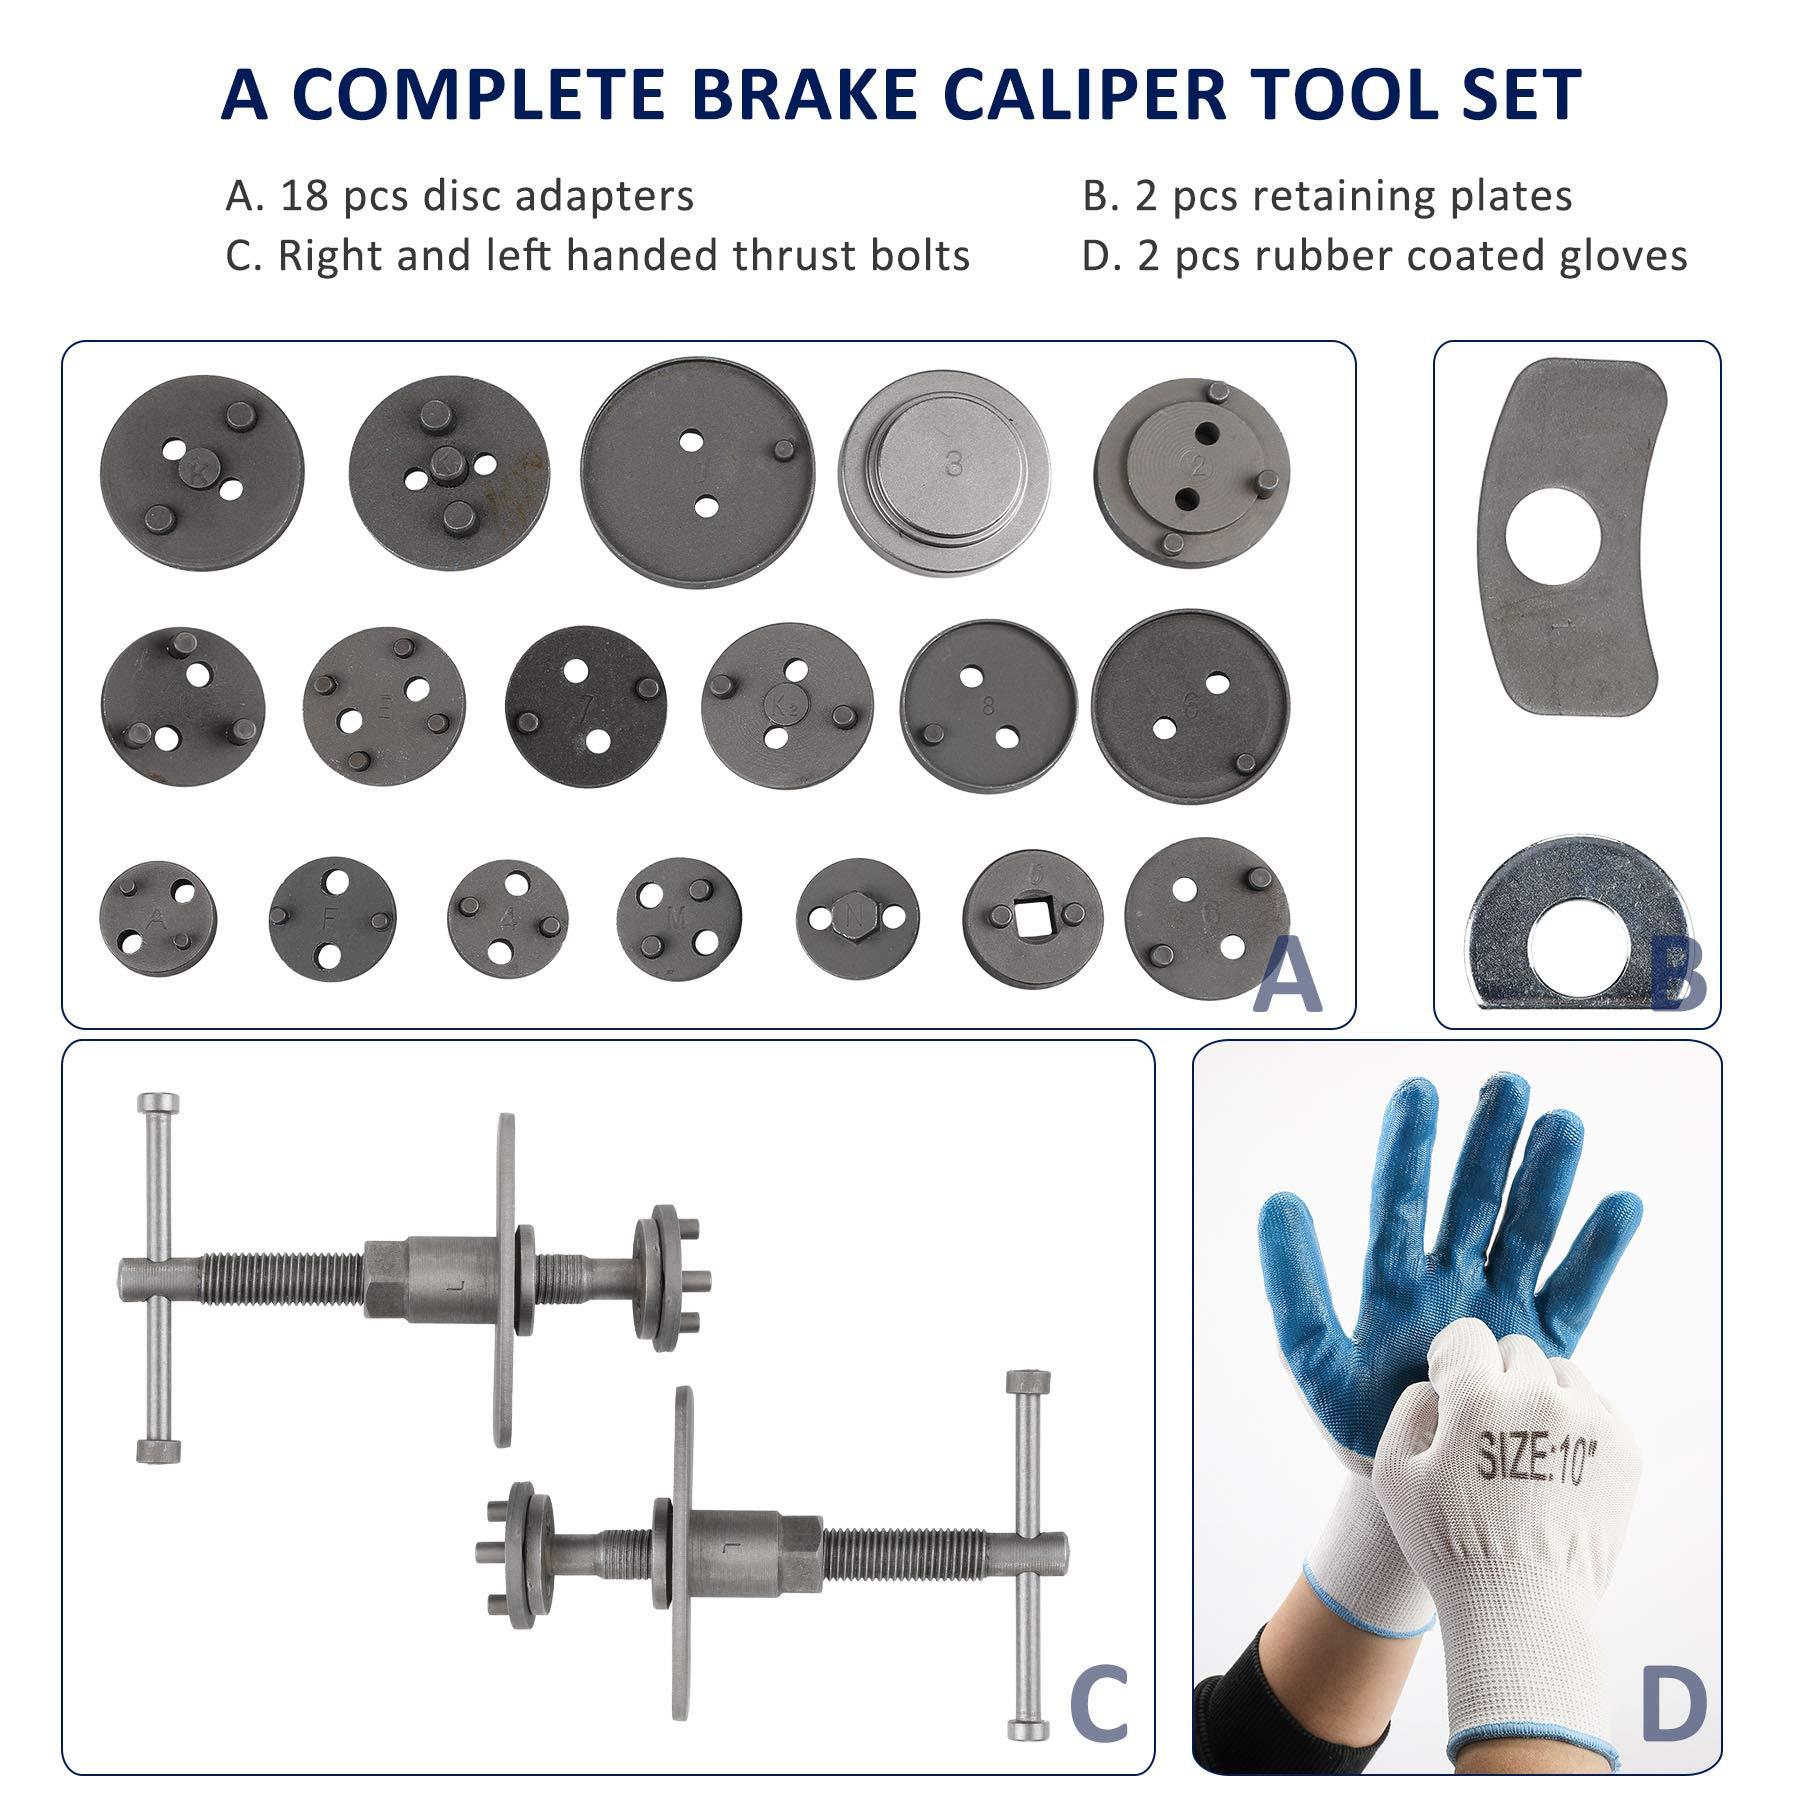 OrionMotorTech 24-Piece Disc Brake Caliper Tool Kit, Front